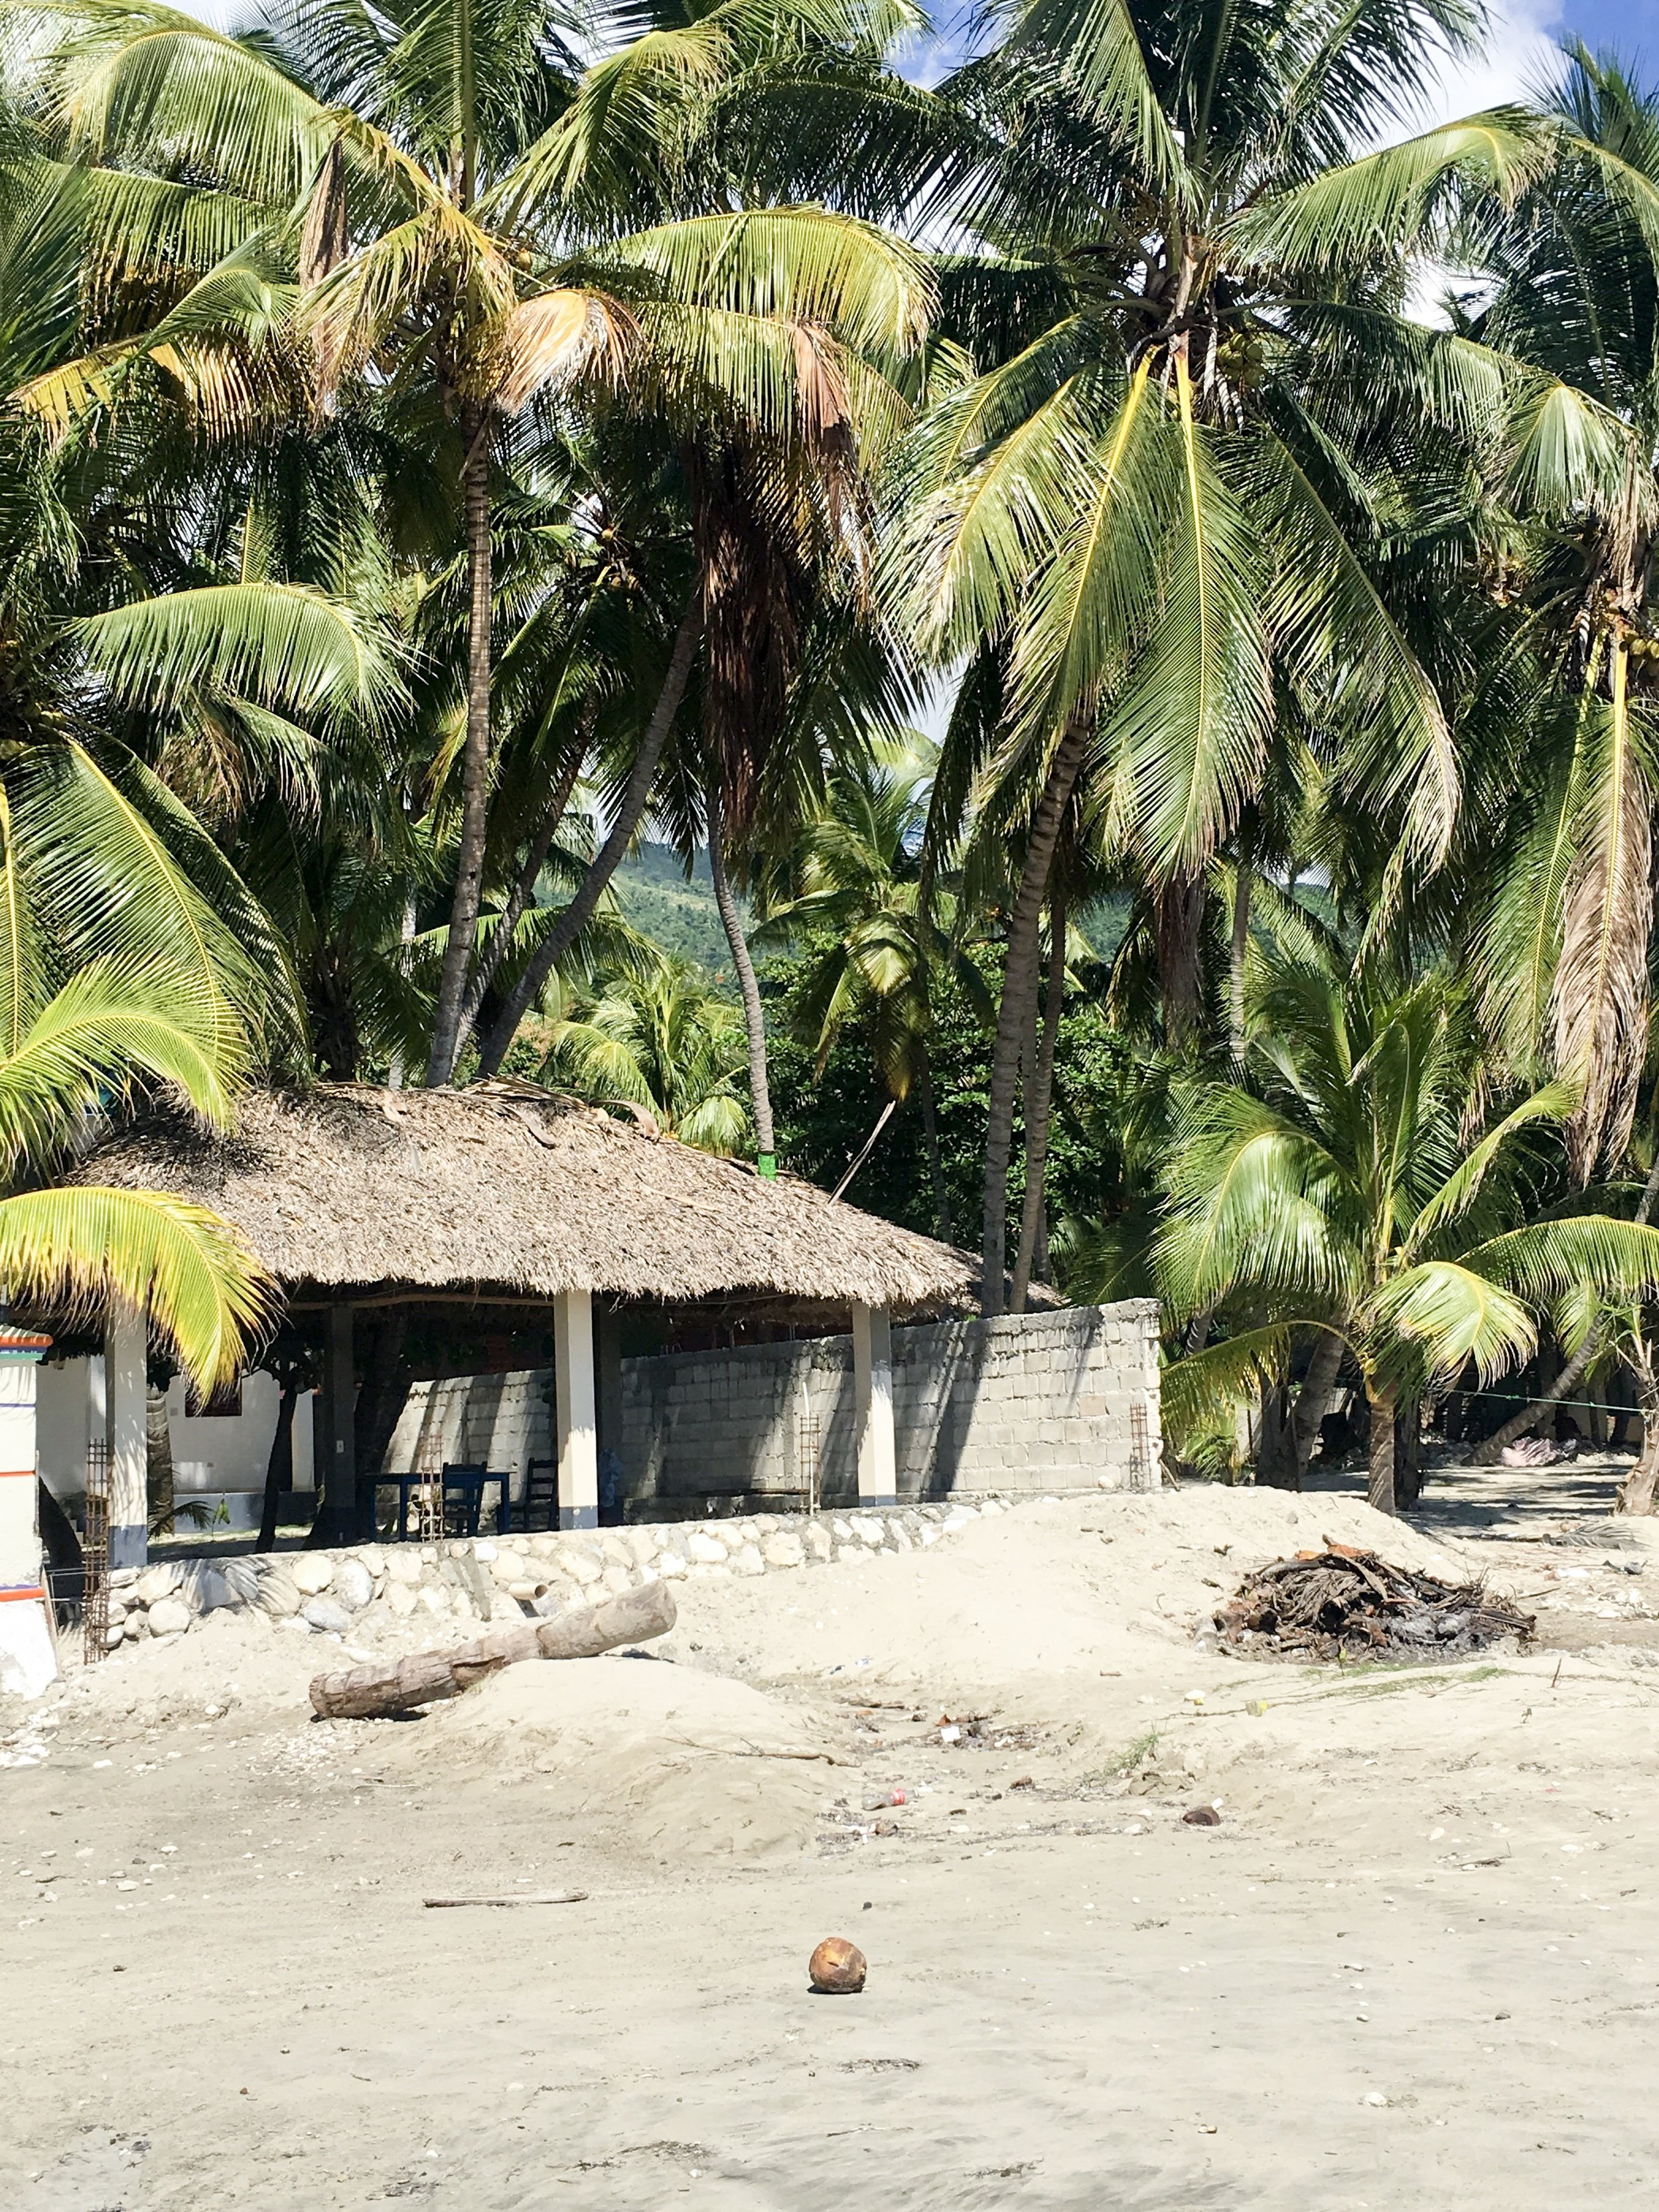 Beach and palm trees.JPG